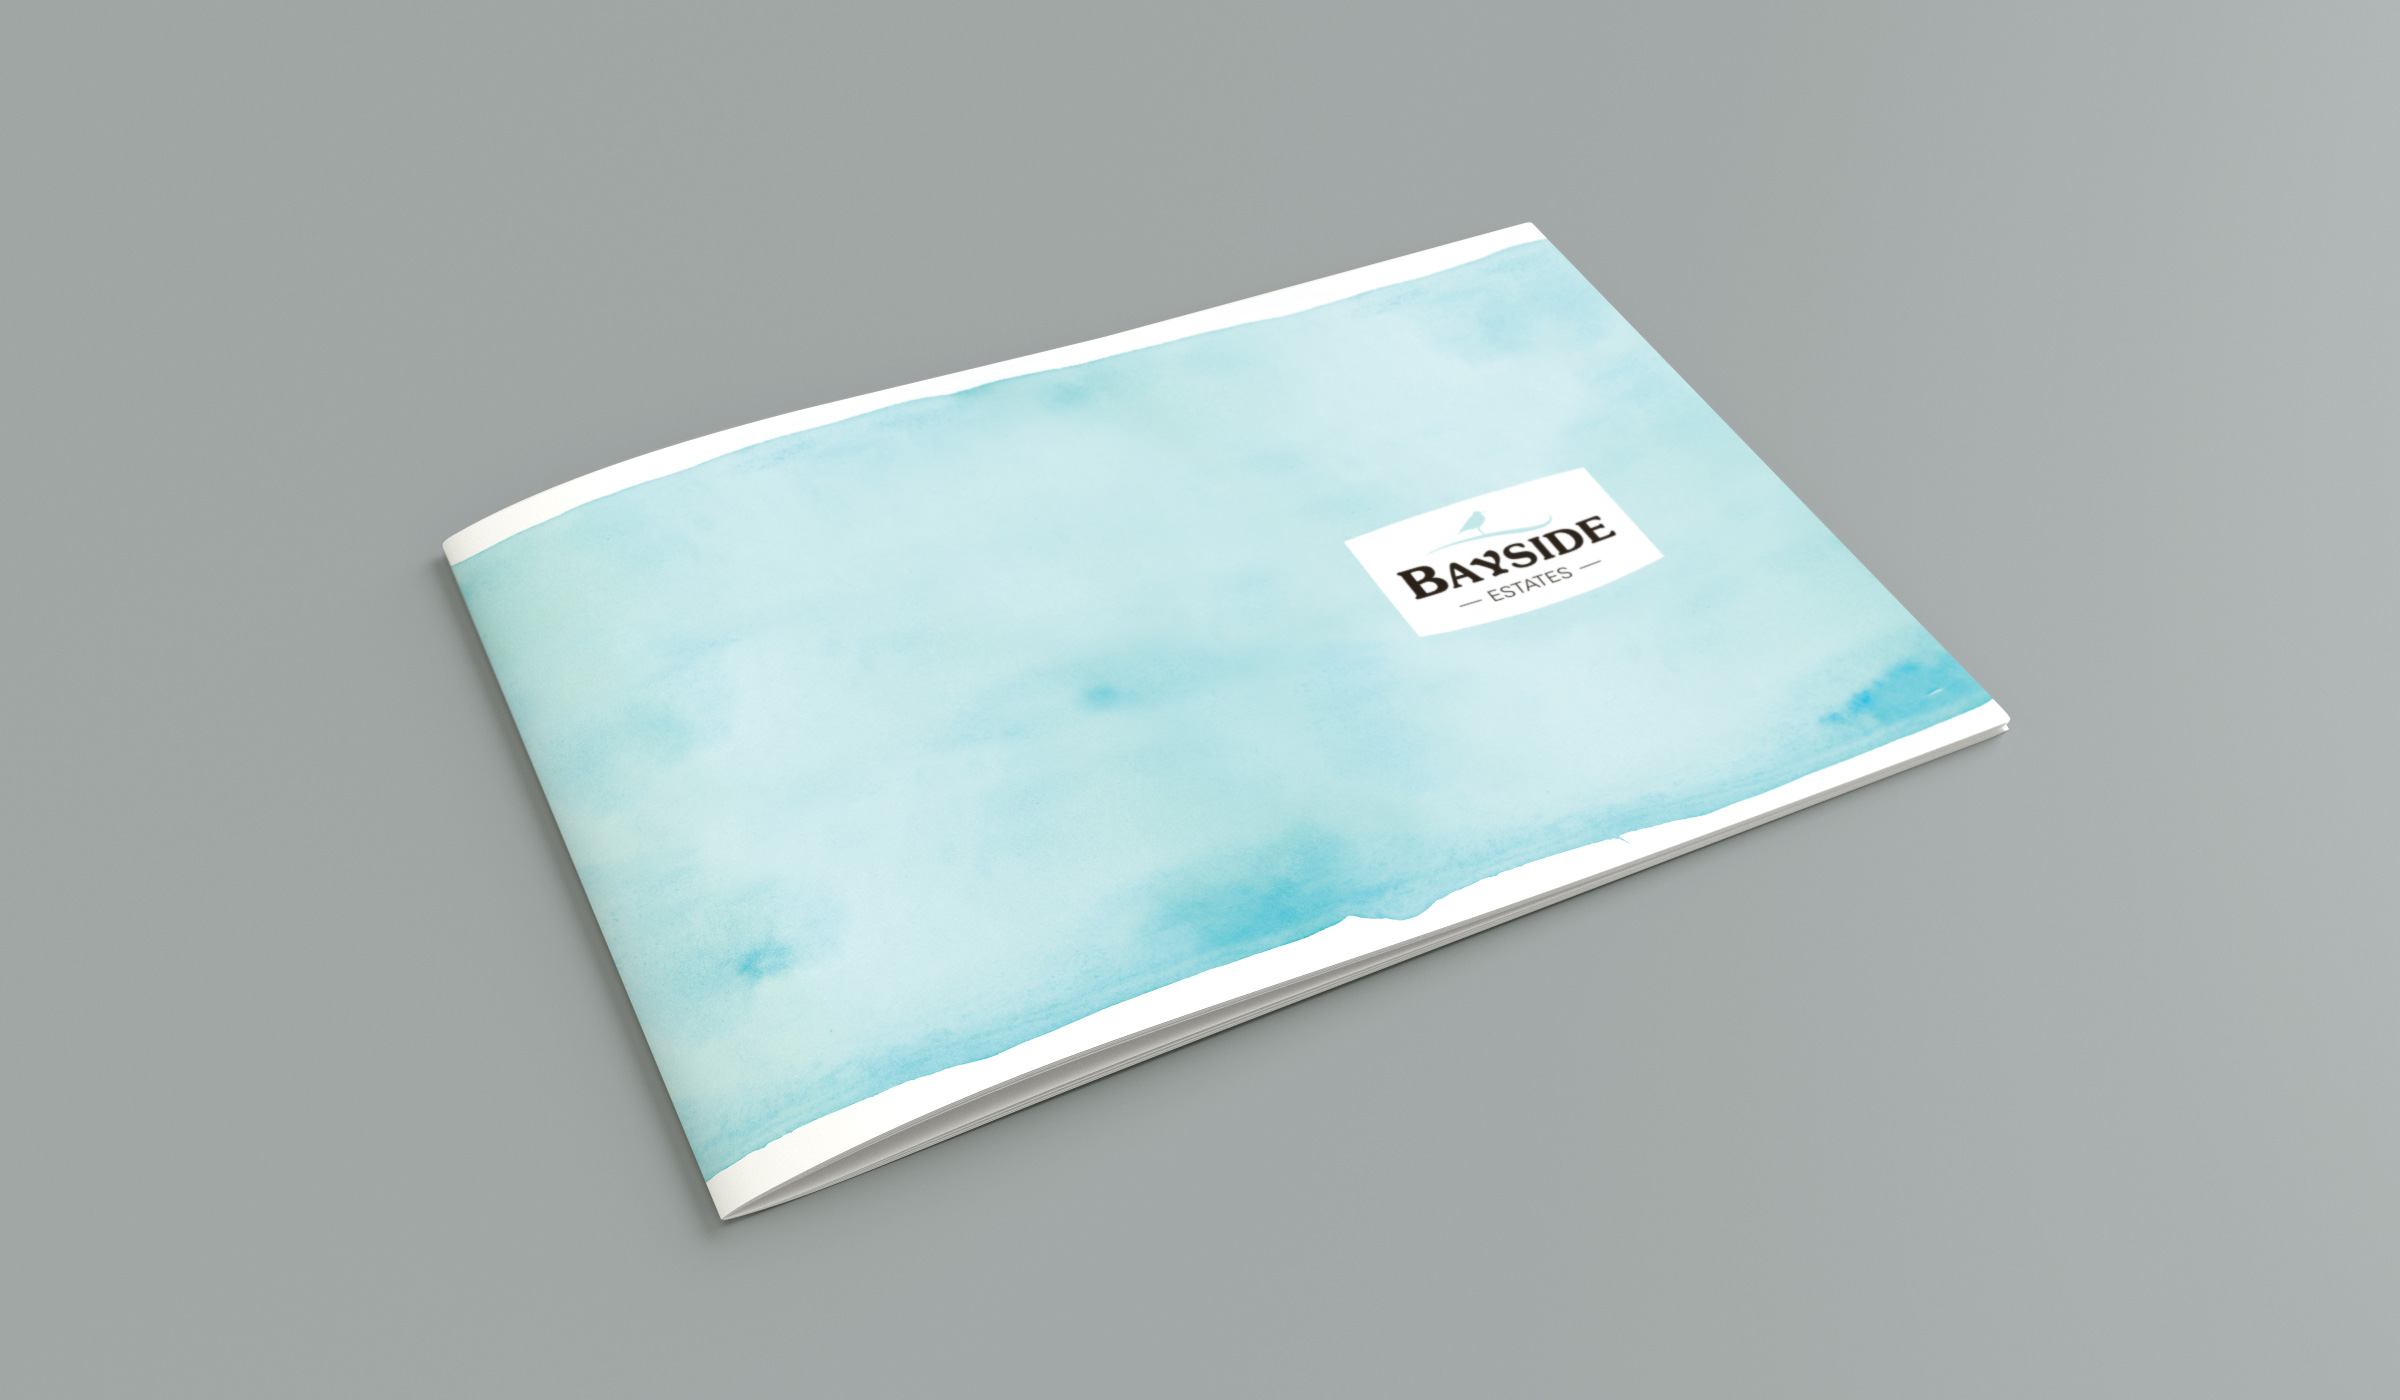 Bayside Estates brochure cover